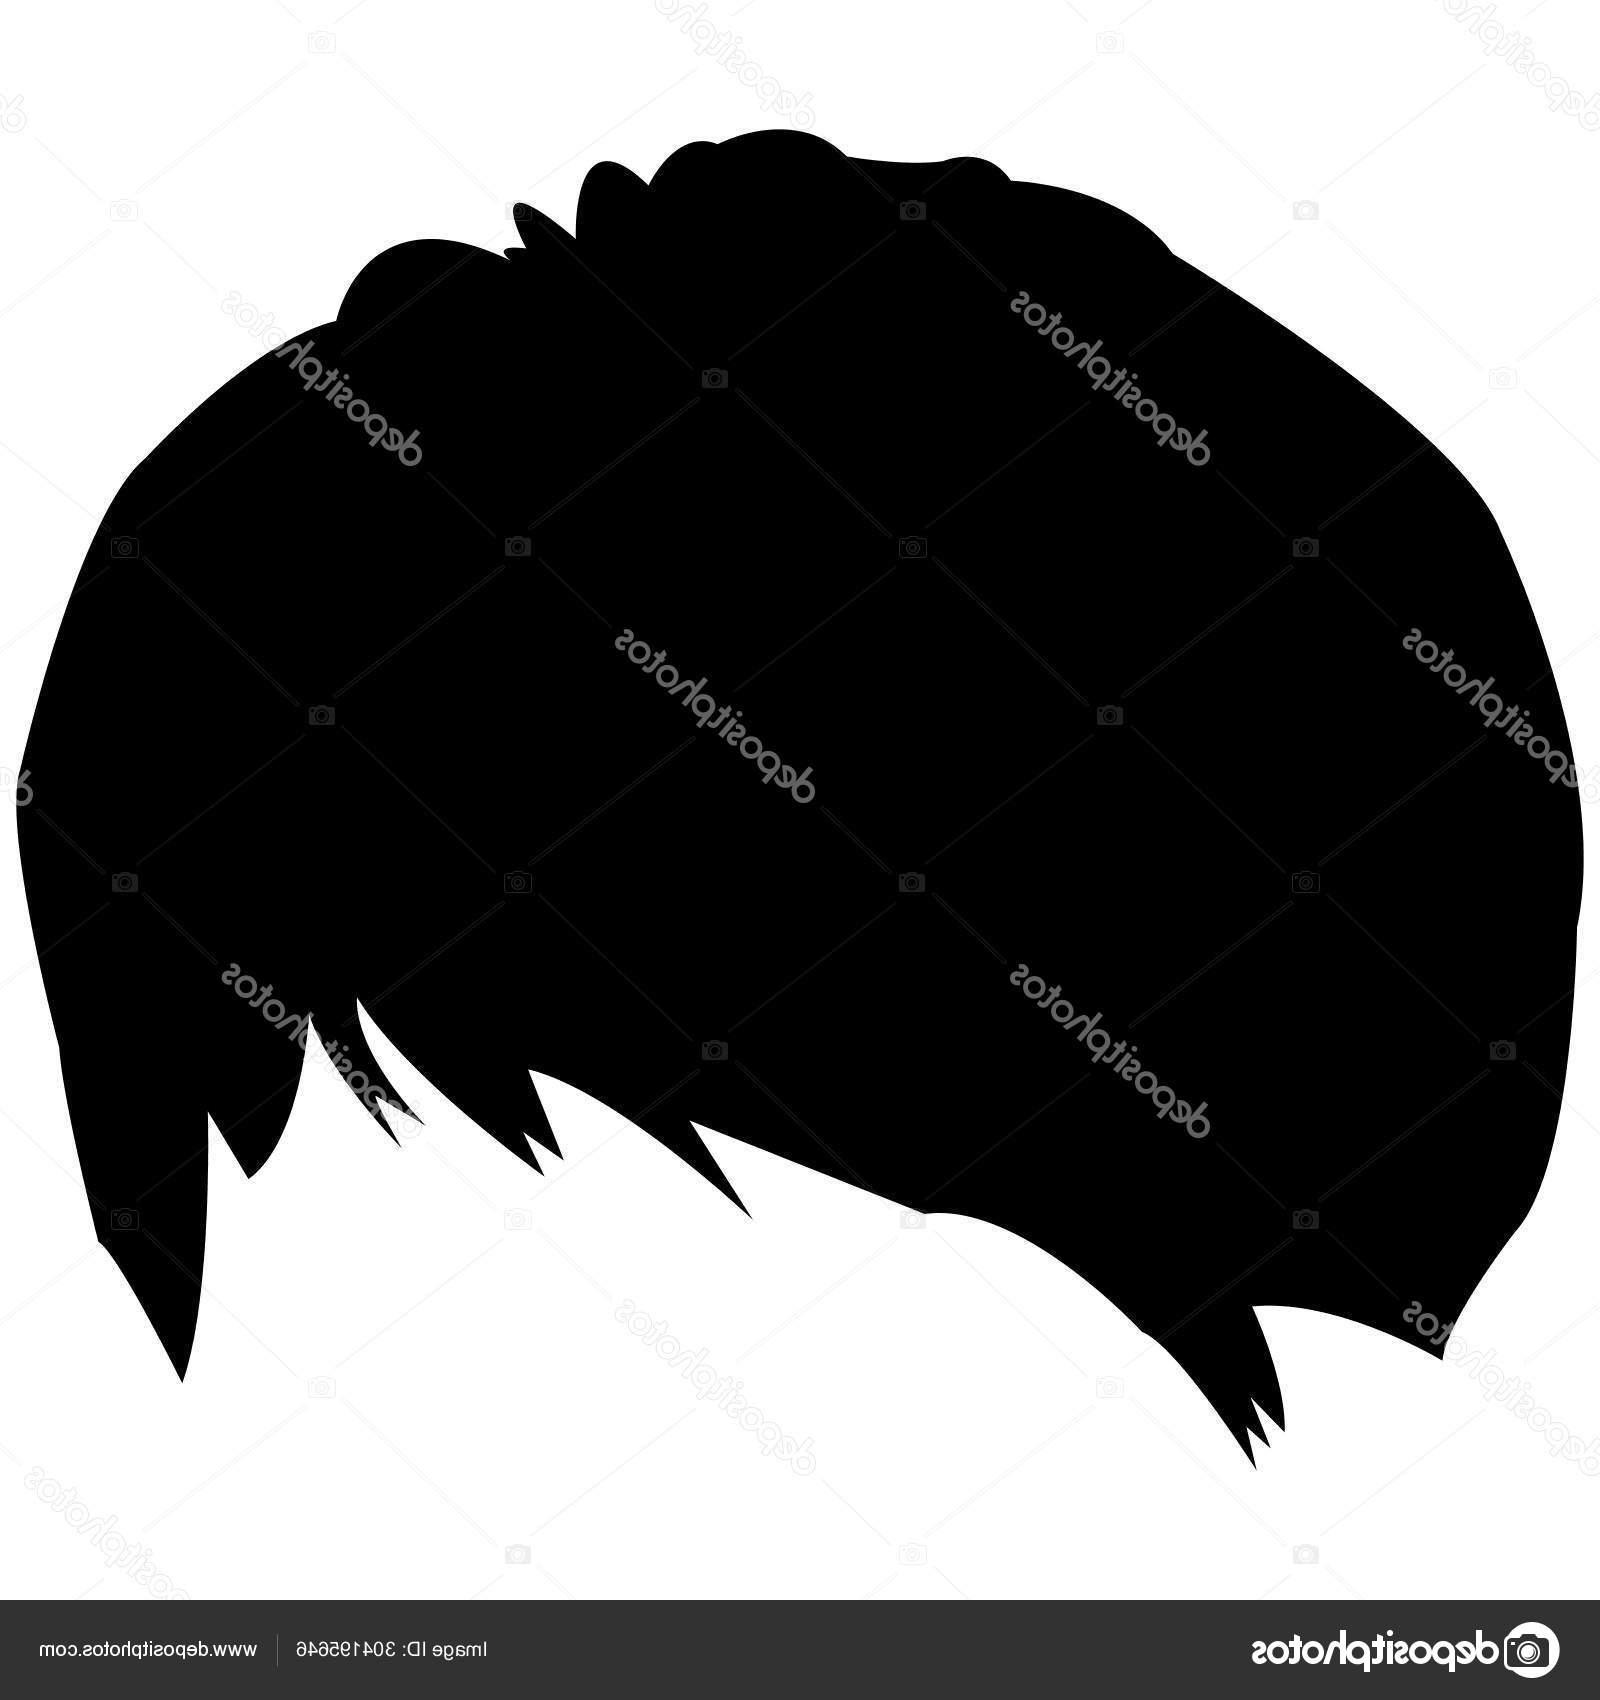 Shag Haircut Простой Дизайн — Векторное Изображение Inside Recent Grungy Shag Haircuts (View 16 of 20)